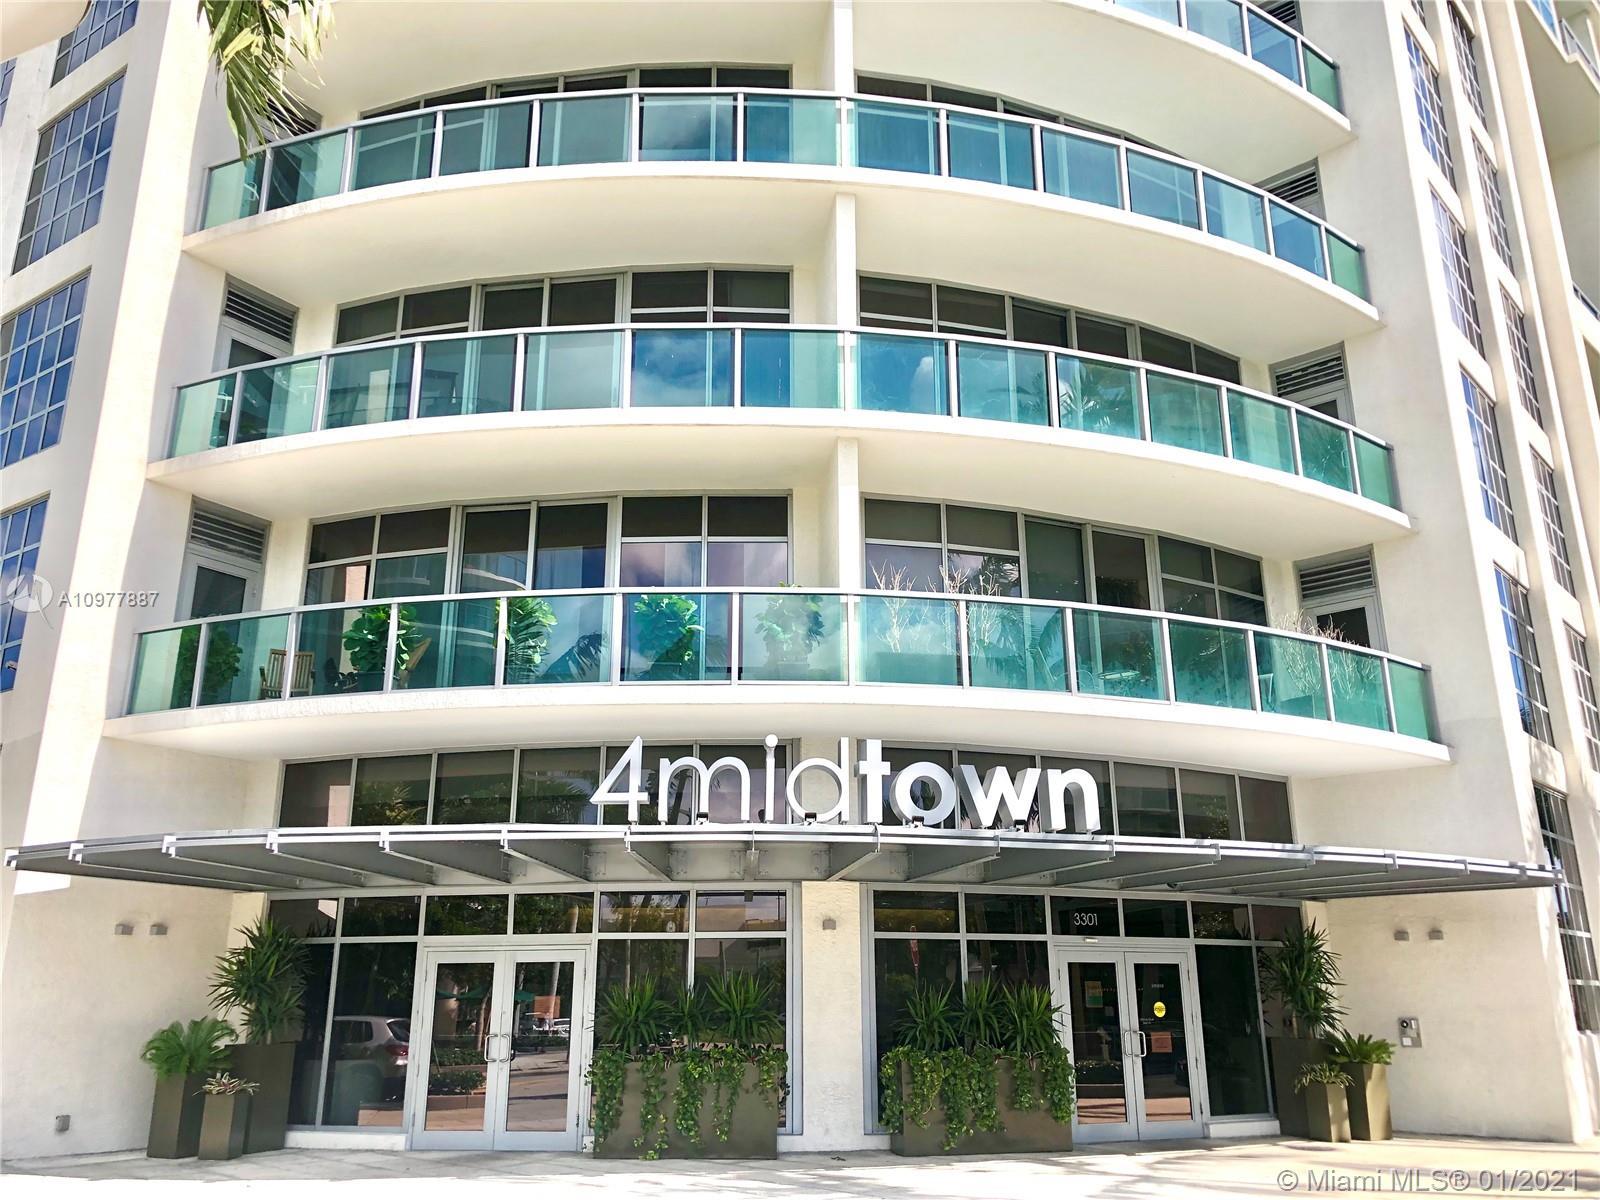 4 Midtown #L0208 - 3301 NE 1st Ave #L0208, Miami, FL 33137